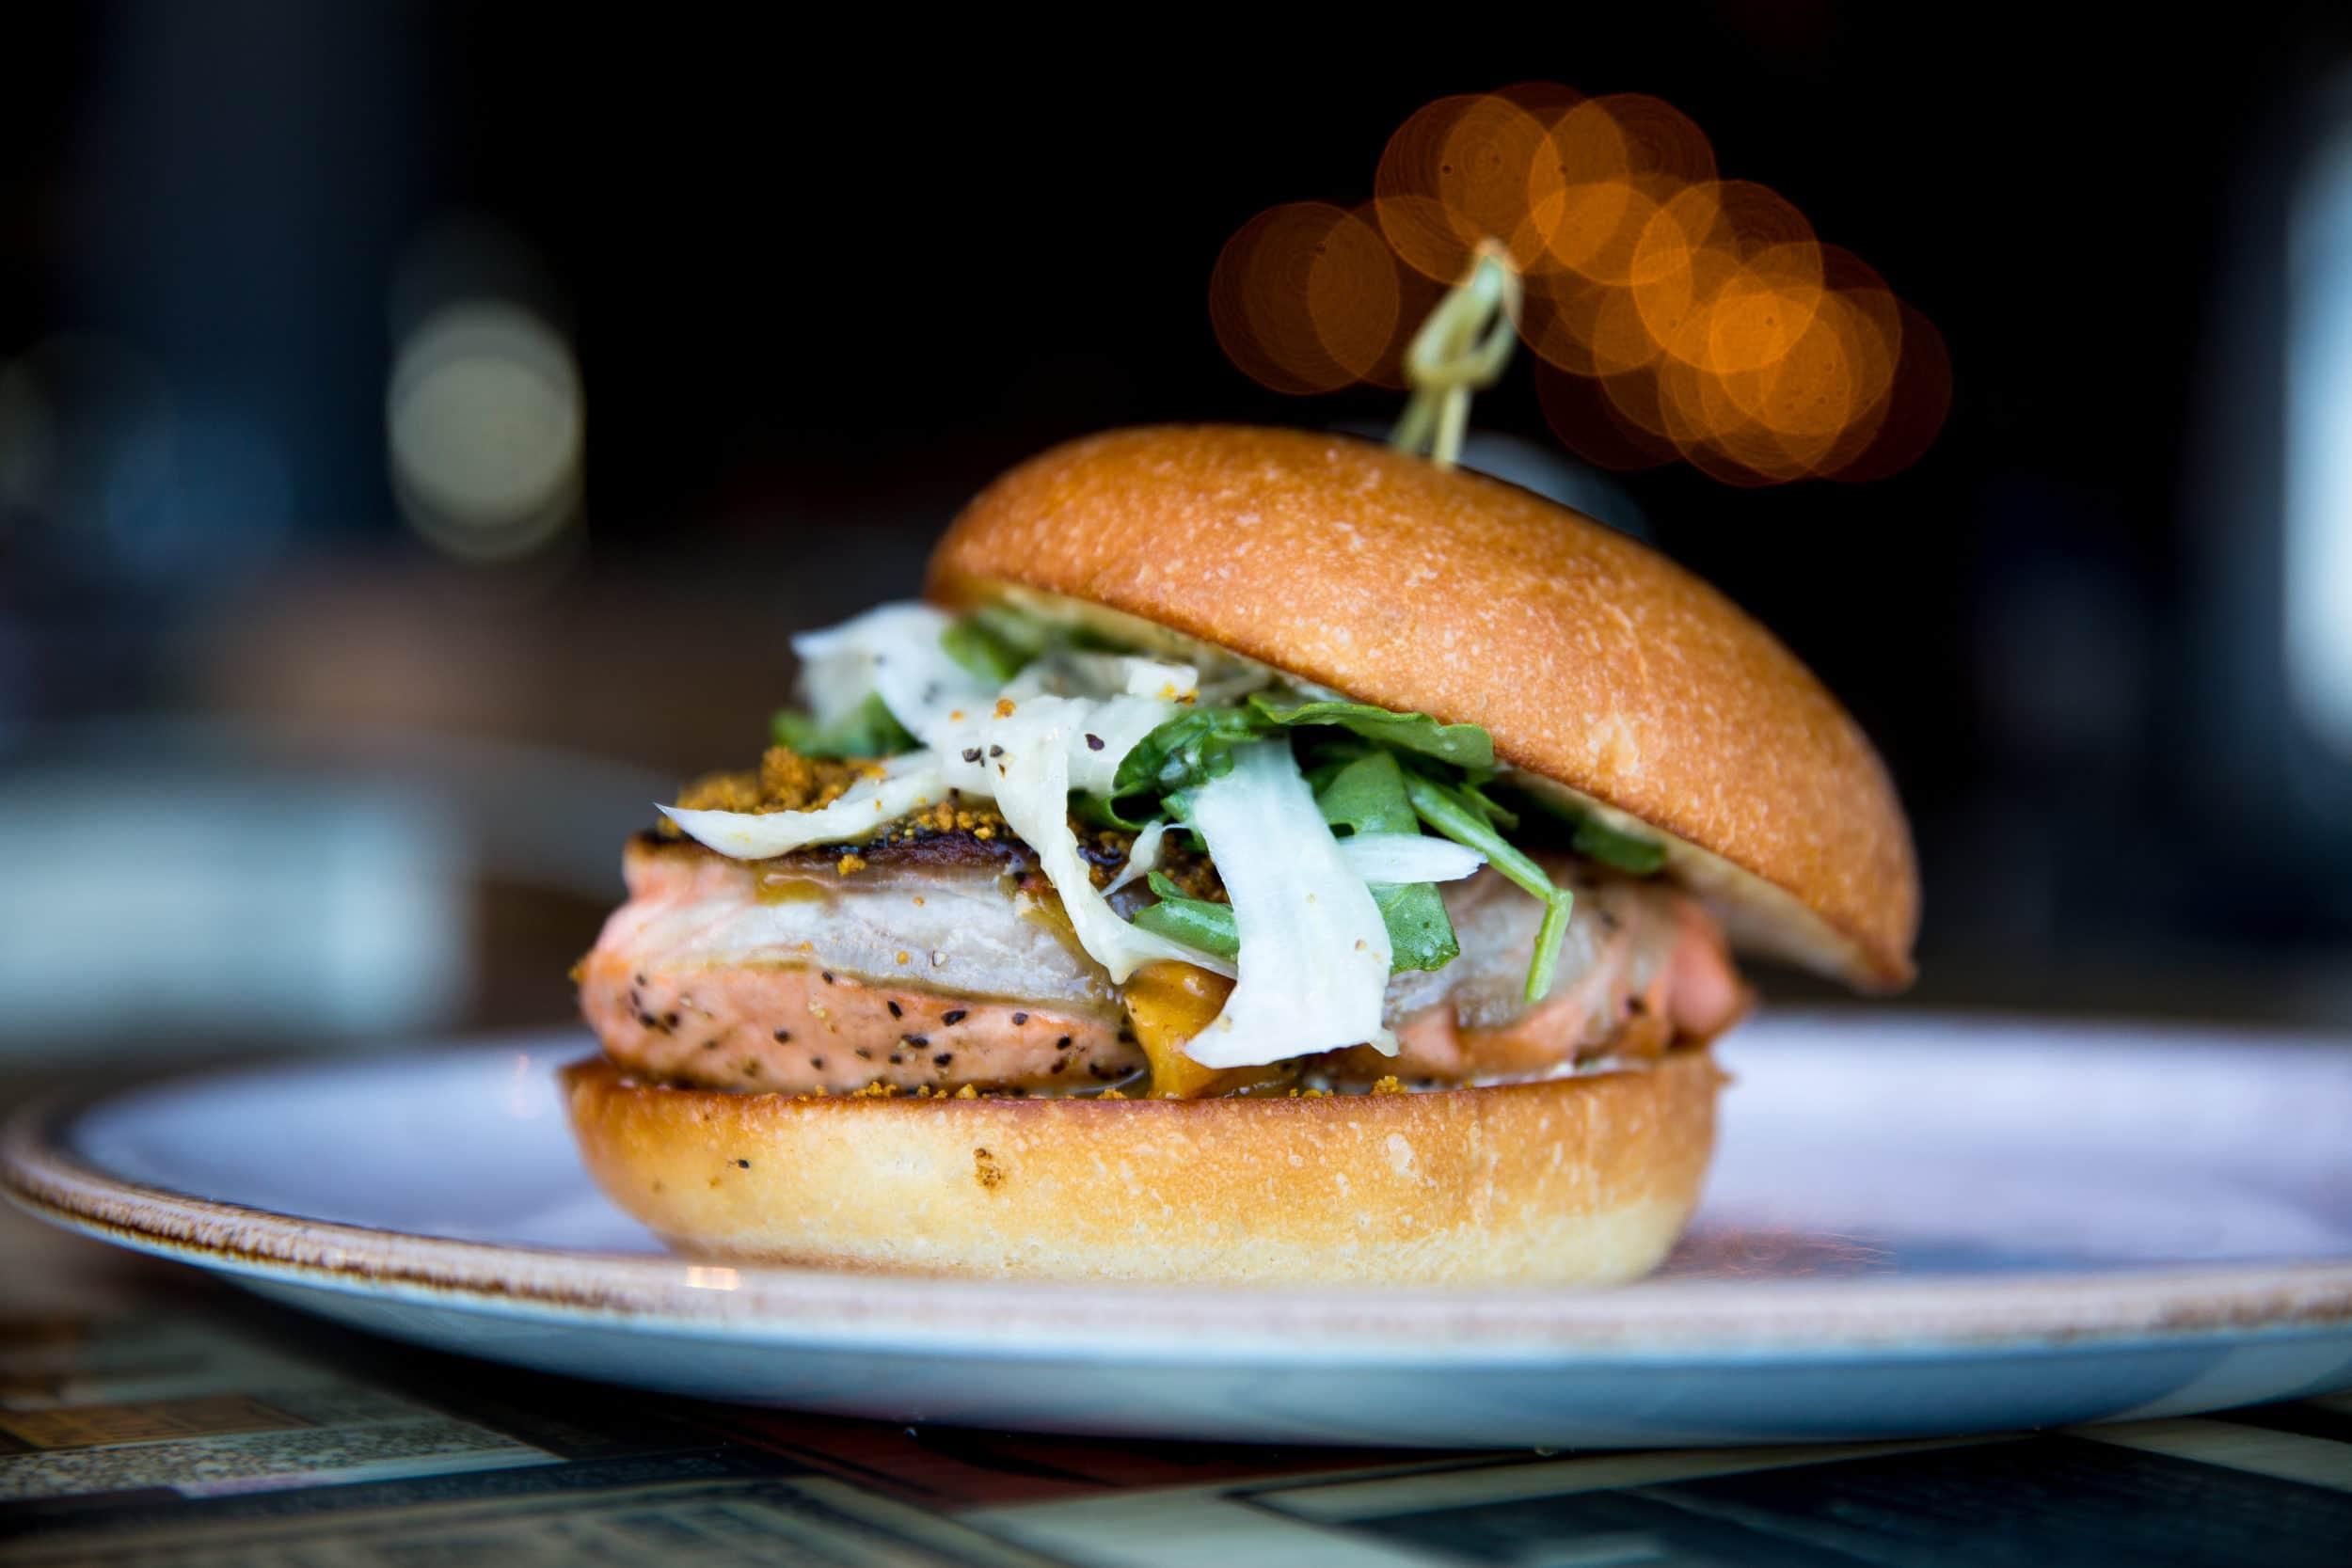 Best Mission Beach restaurants: Draft salmon burger